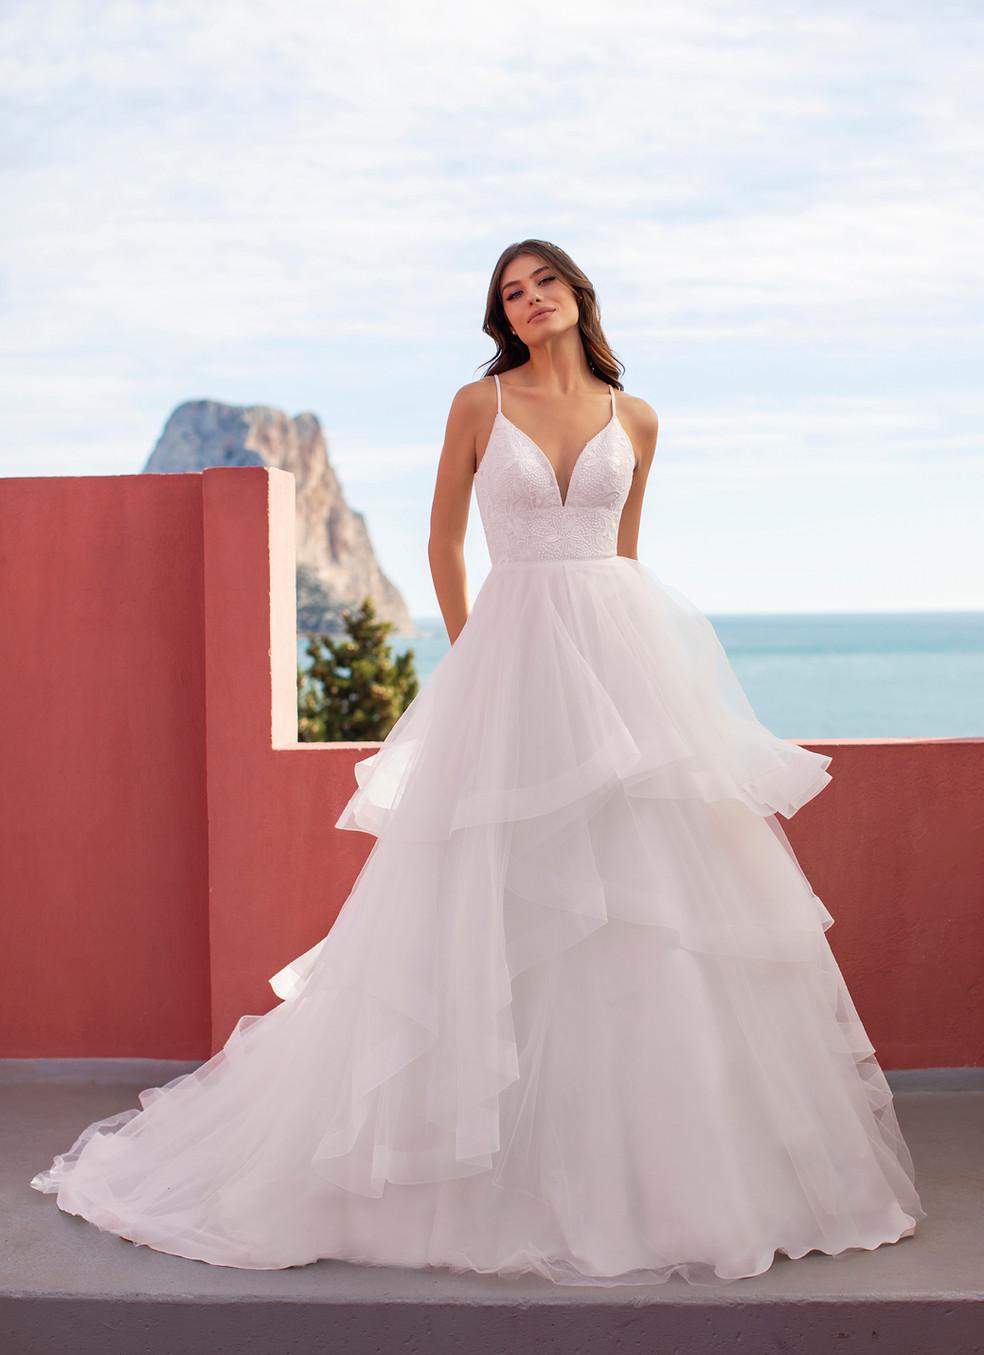 Shadevenne, White One Bridal